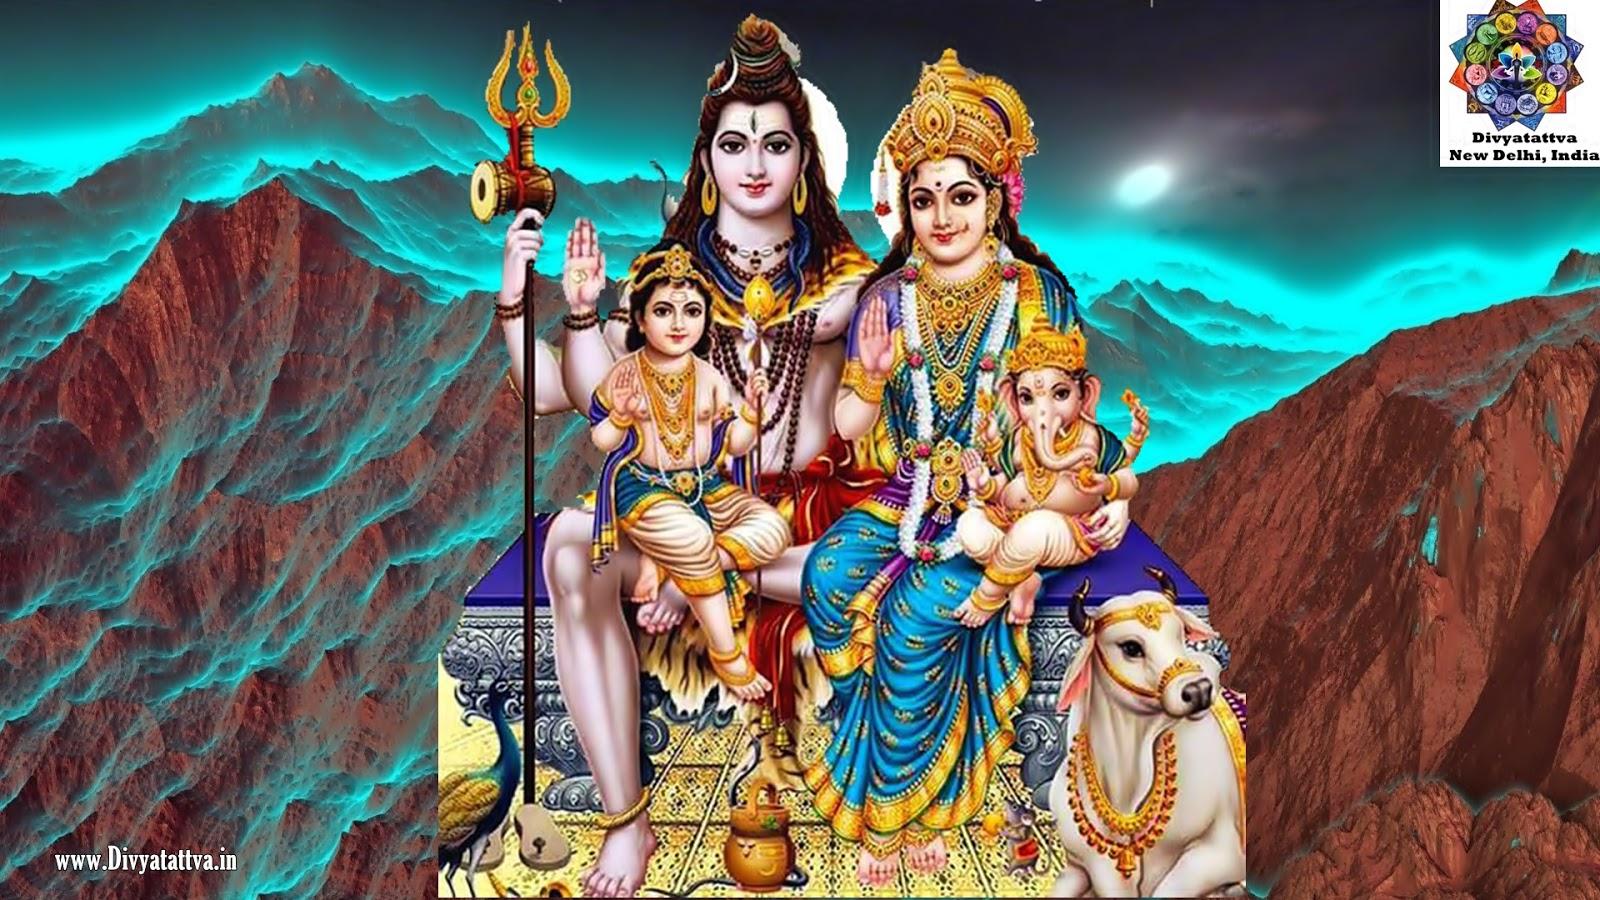 shiva parvati kartikeya ganesha parivar hd wallpaper www.divyatattva.in